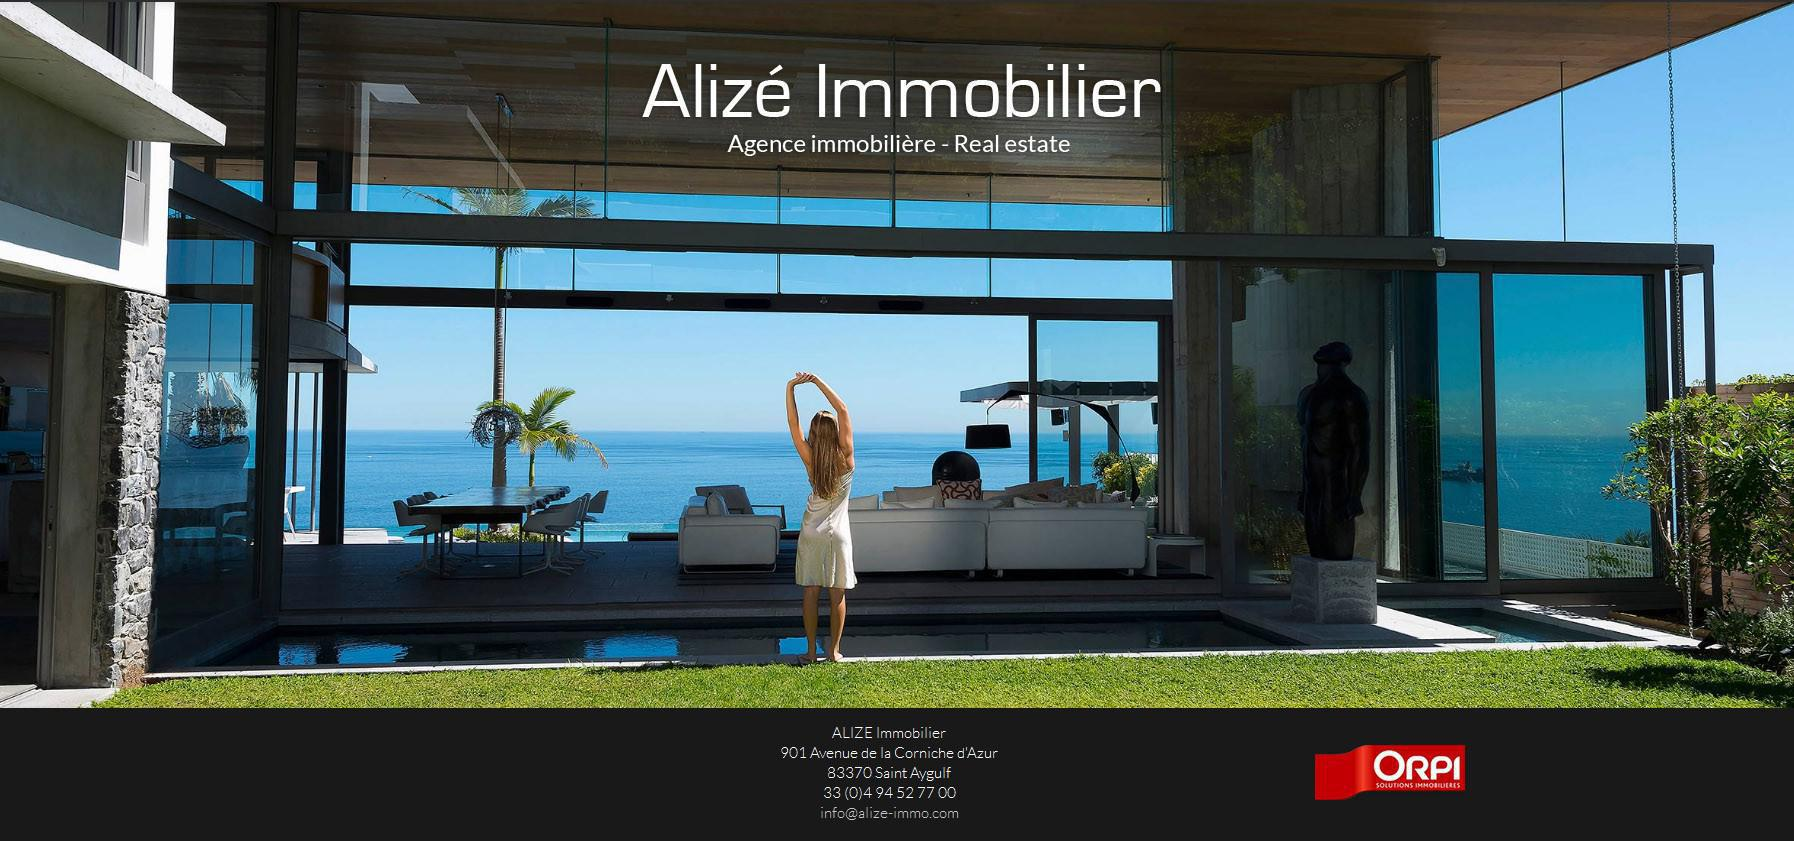 Image de l'agence Alize Immobilier Orpi